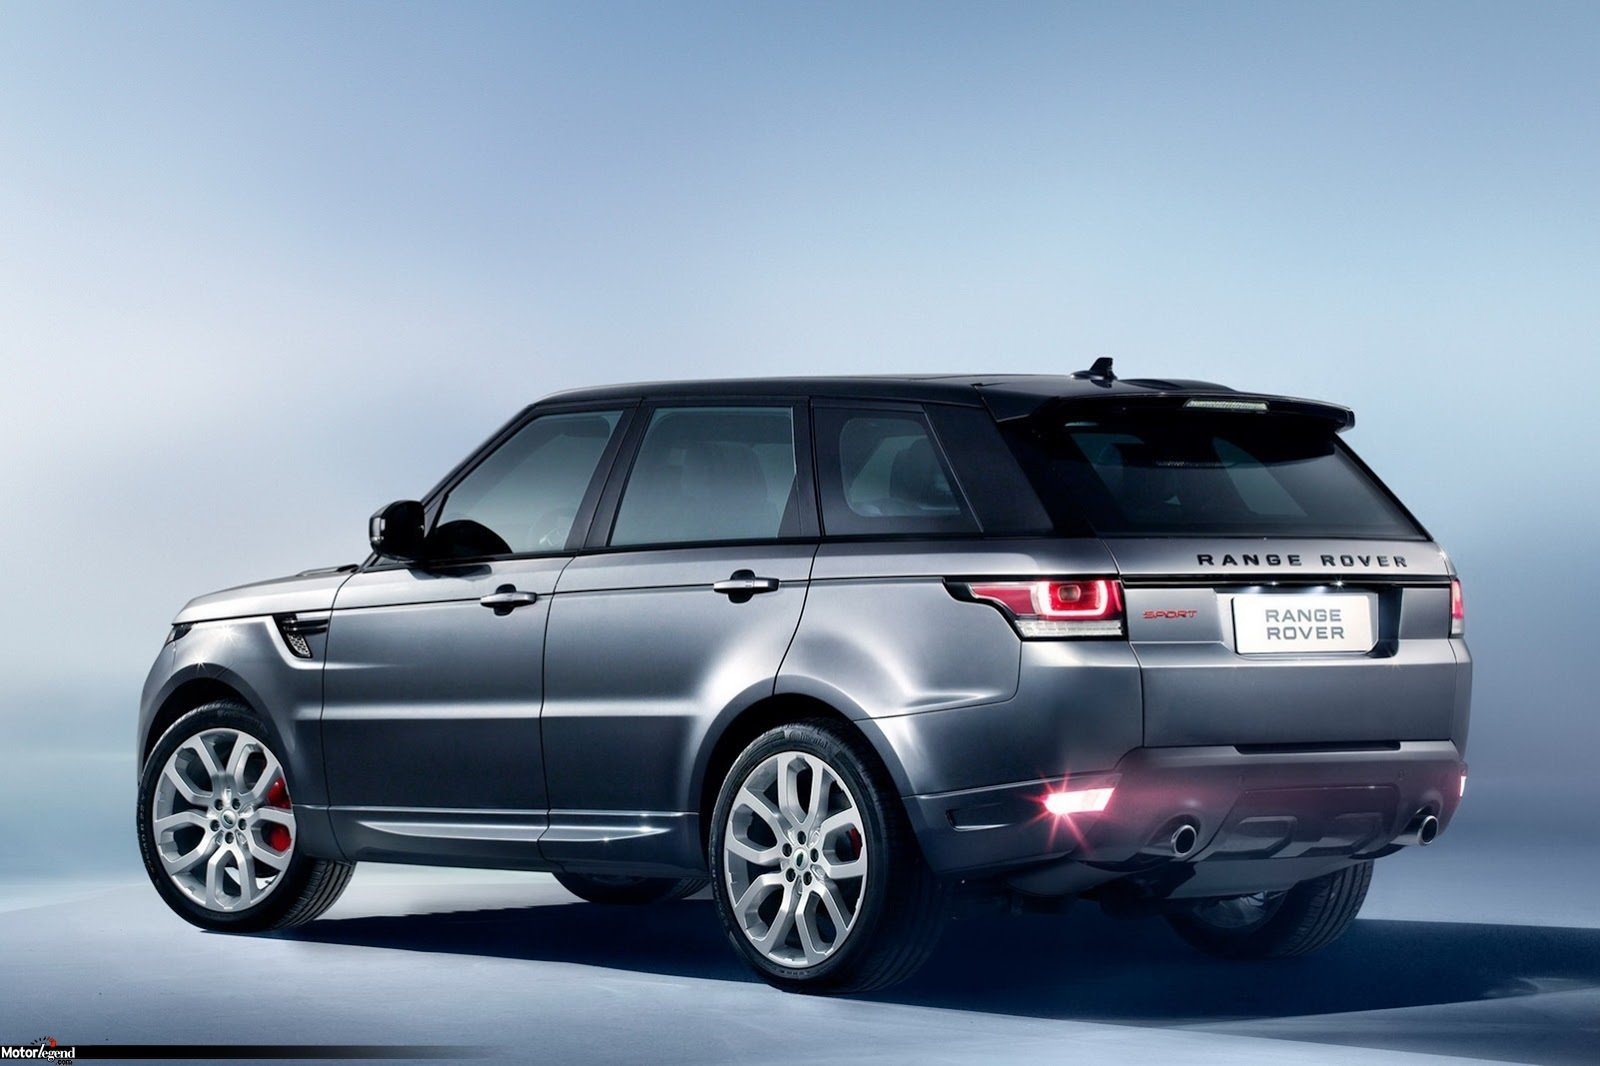 range rover sport premi res images actualit automobile motorlegend. Black Bedroom Furniture Sets. Home Design Ideas